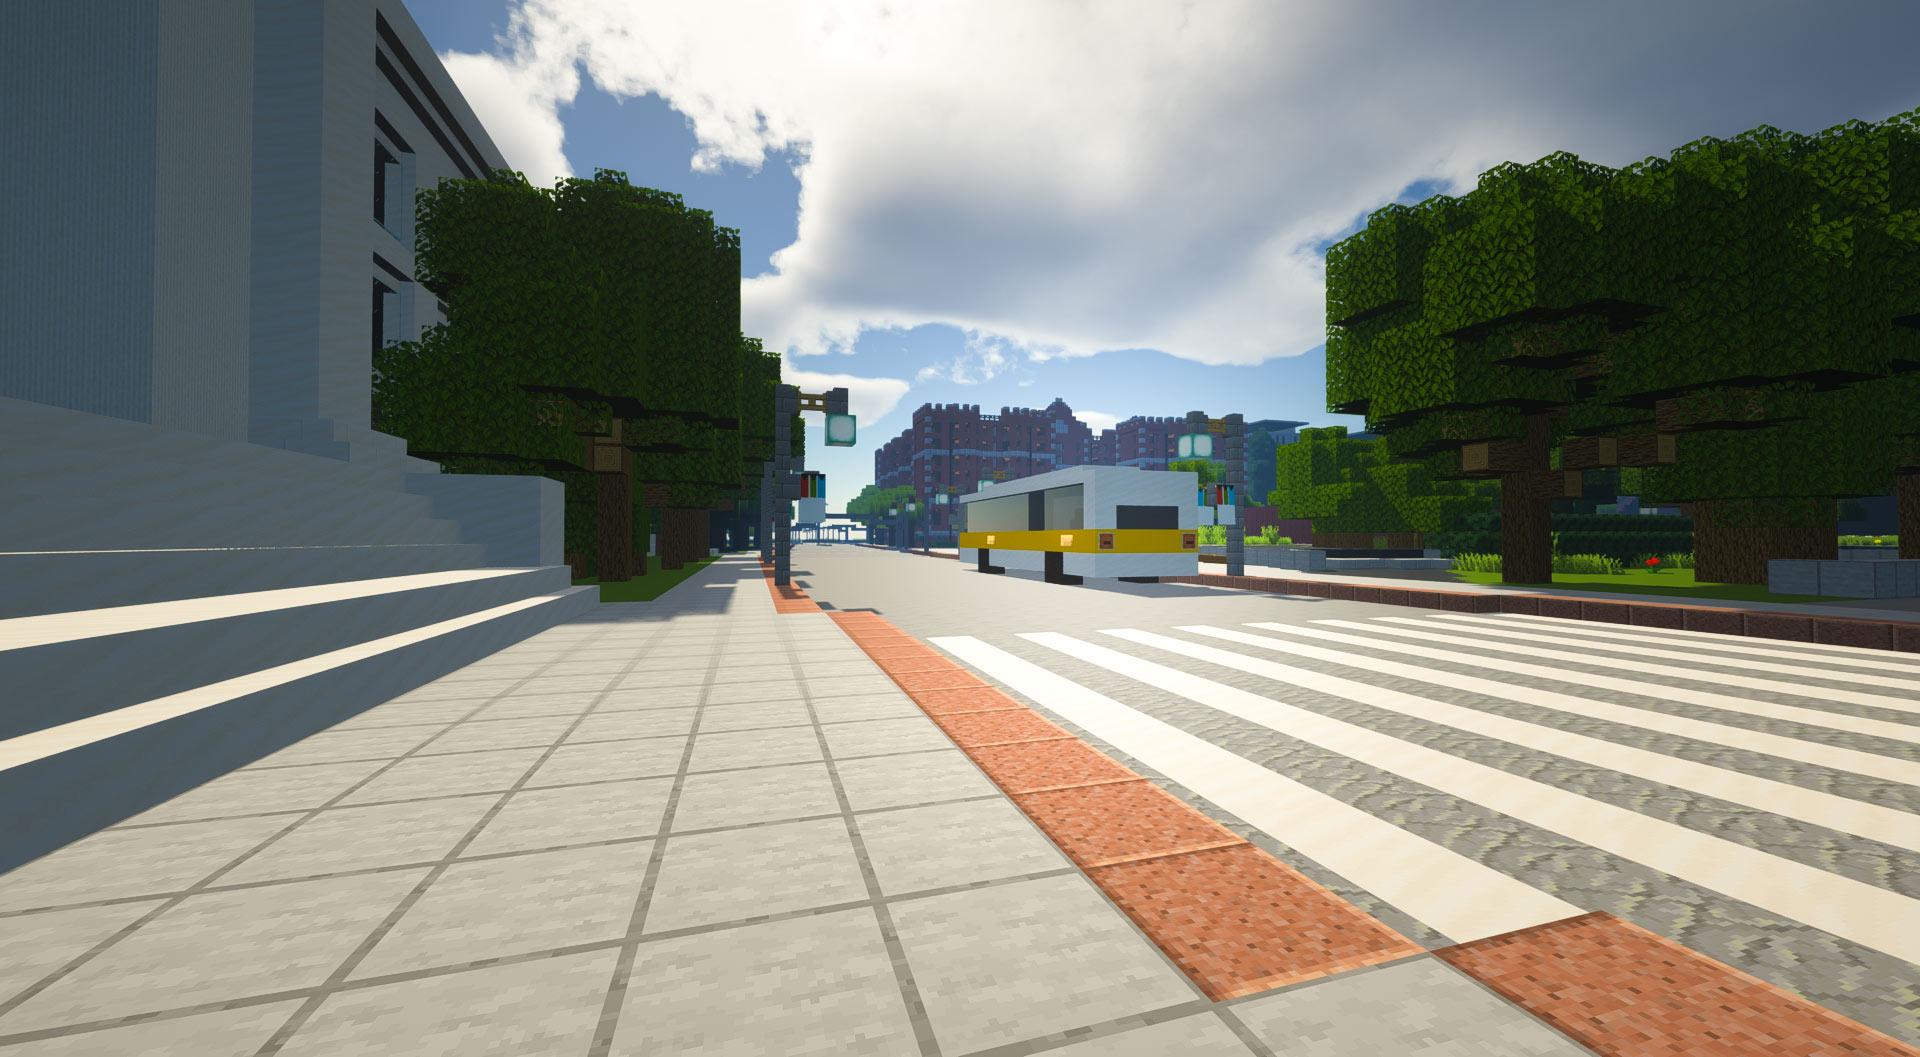 Minecraft bus stop on Mass Ave